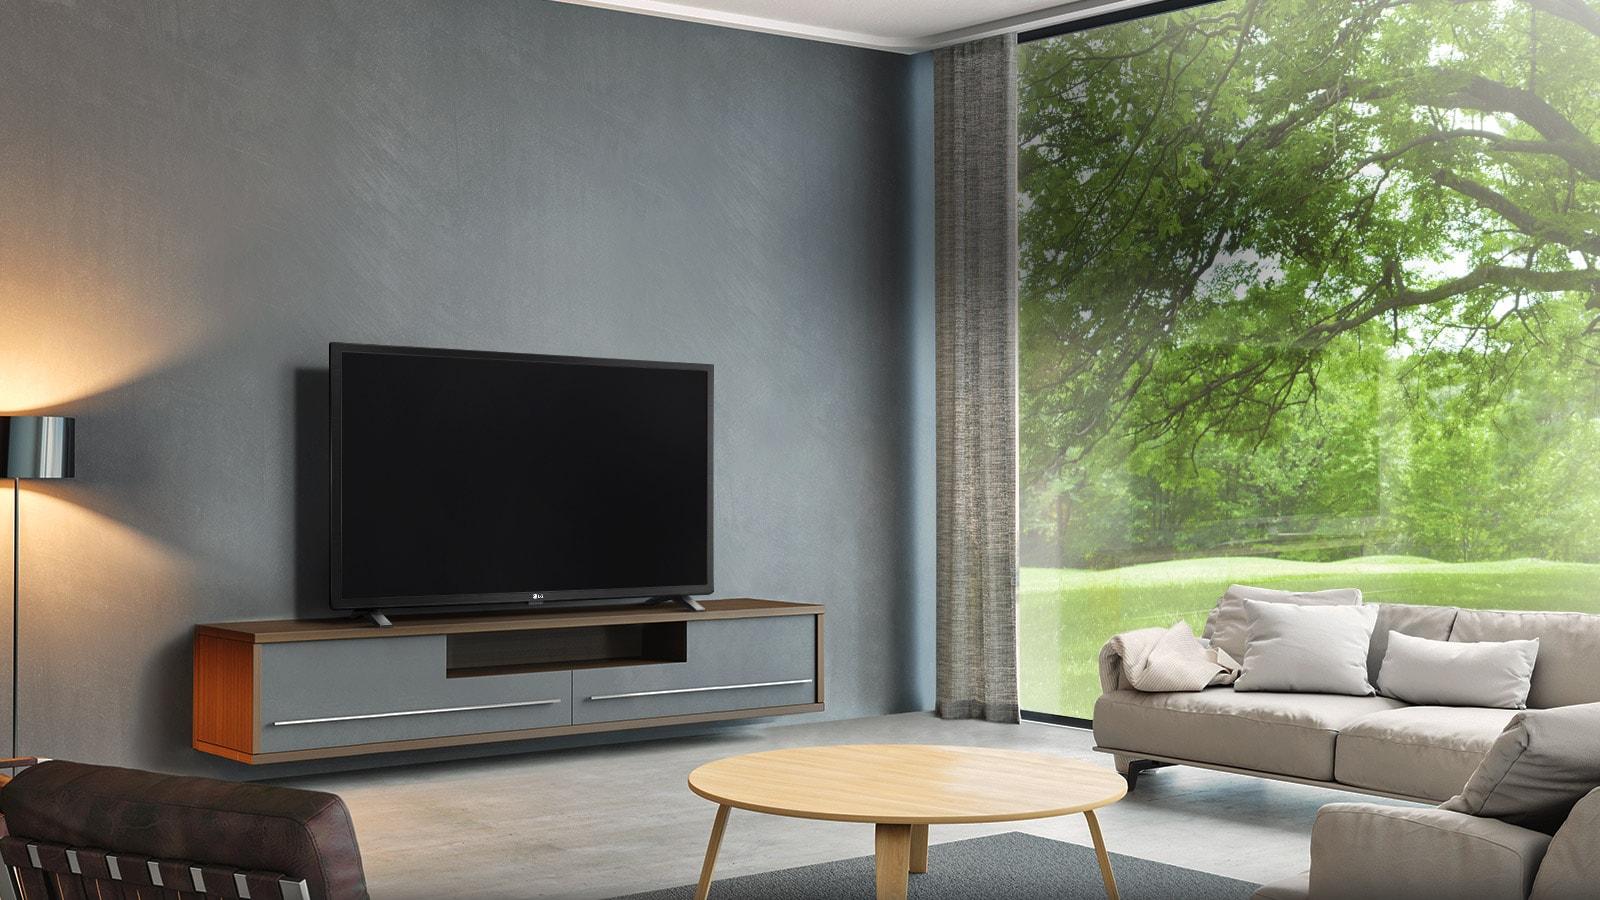 TV-FHD-LM63-09-Design-Desktop